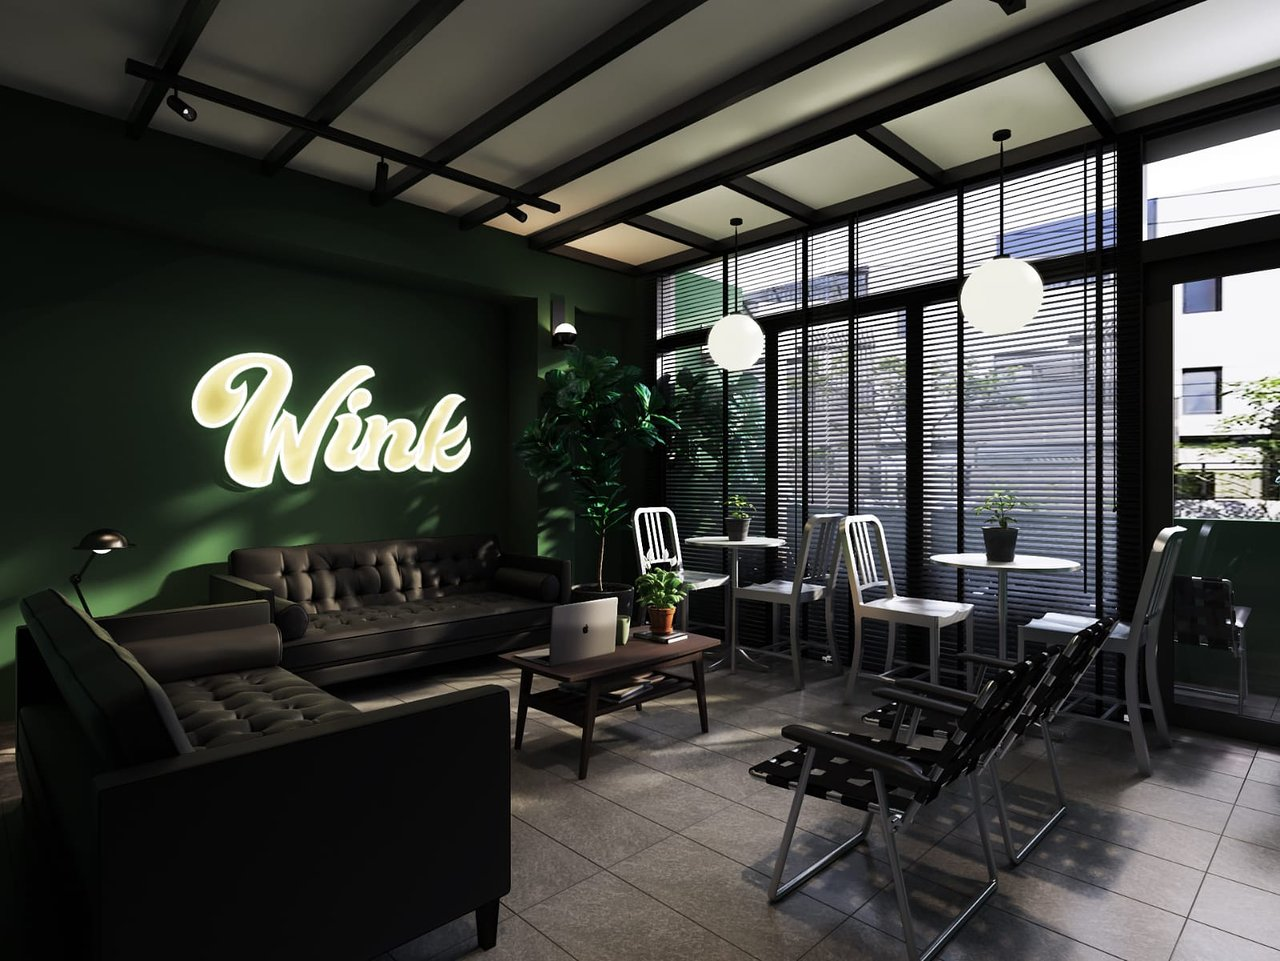 Top Budget Hotel in Singapore-Wink Capsule Hotel